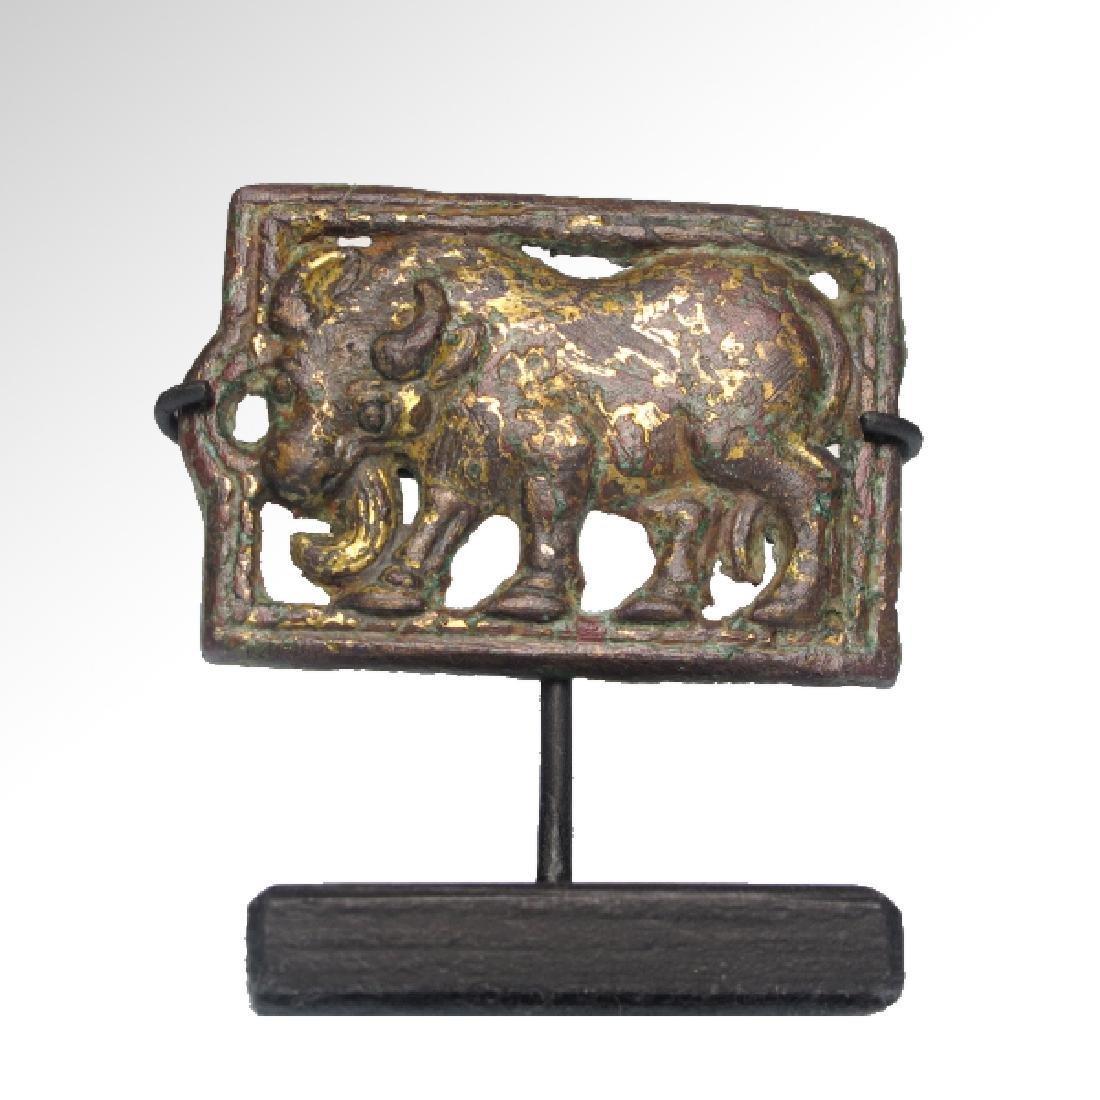 Ordos Gilt Bronze Open-Work Plaque with Bull, c. 500 - 2